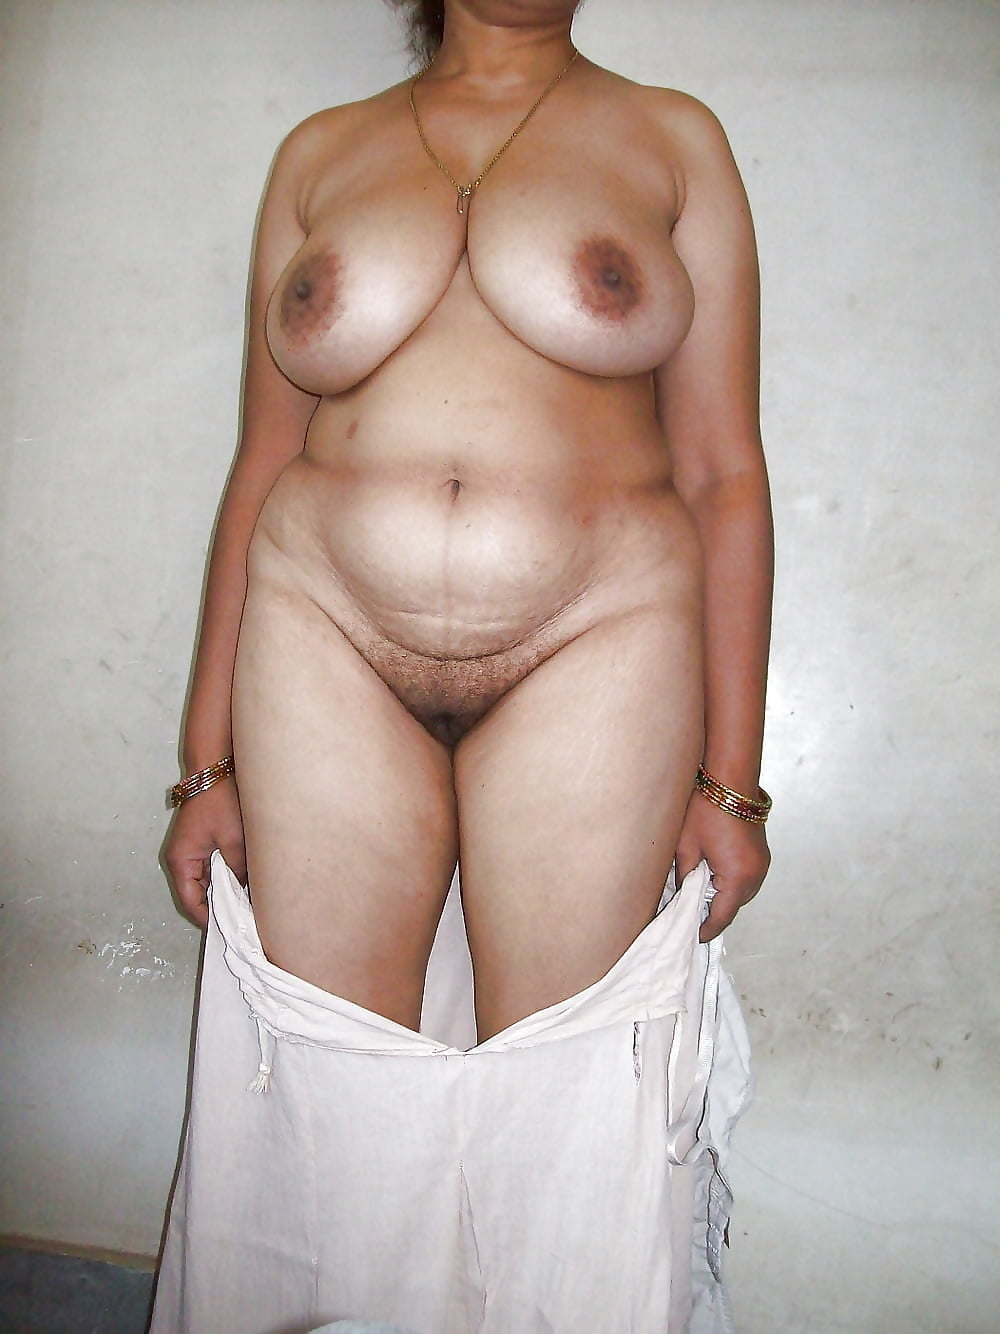 Mature Indian Woman Image